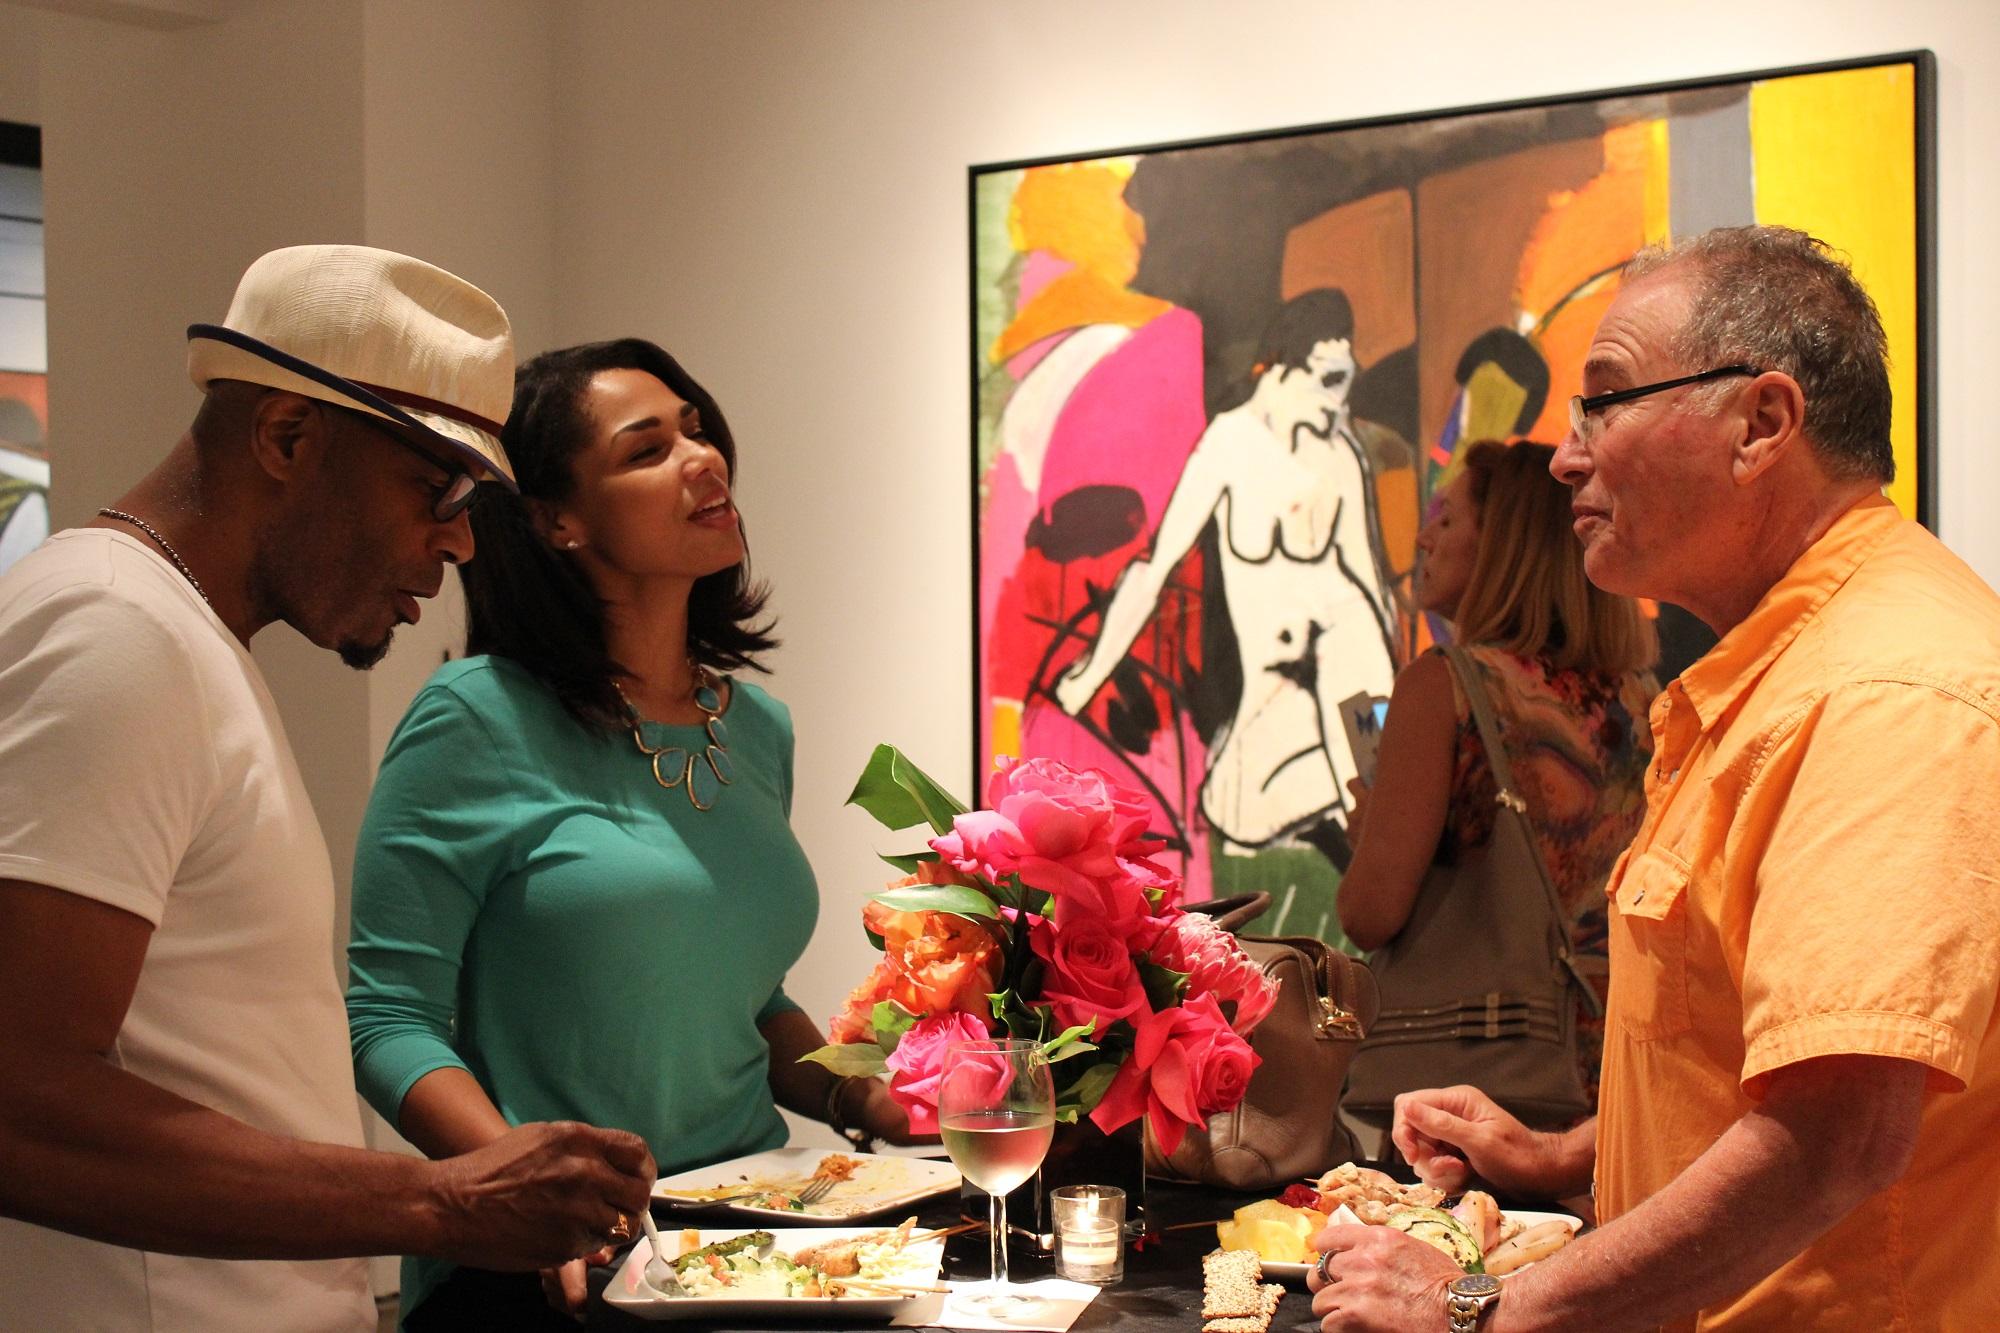 Frank Schroeder Bill Lowe Gallery Opening 28.JPG